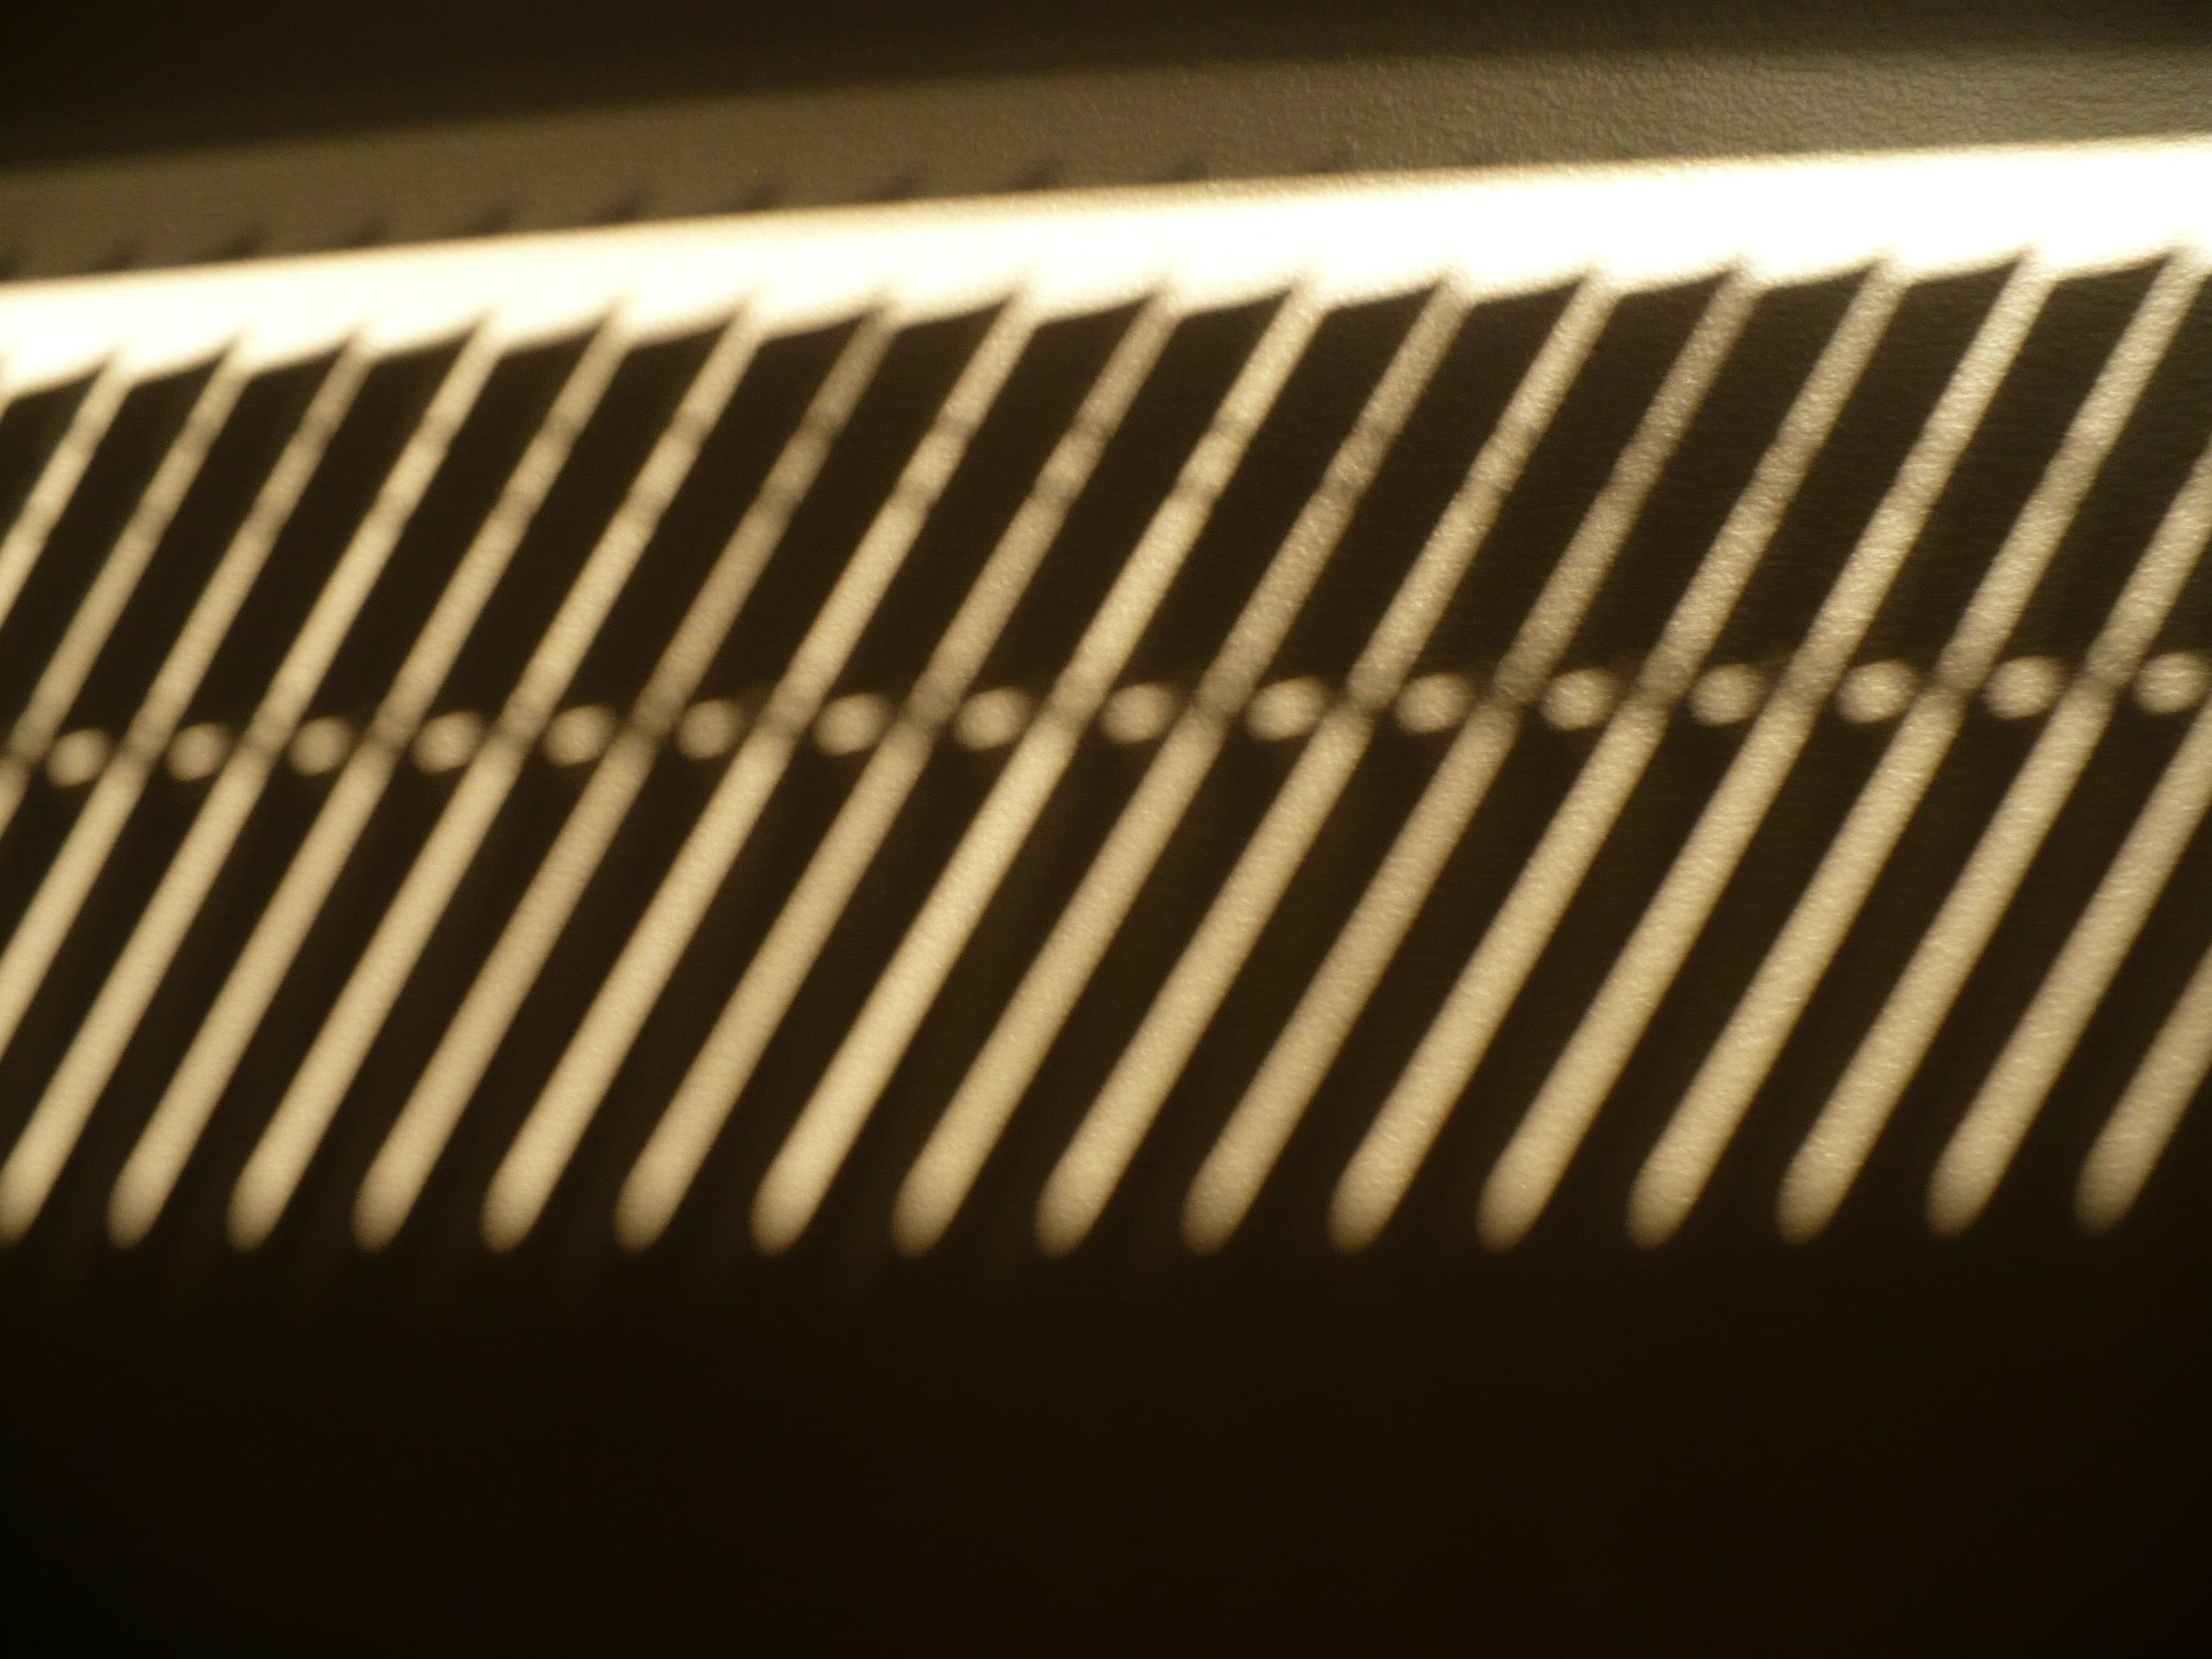 shadow patterns |